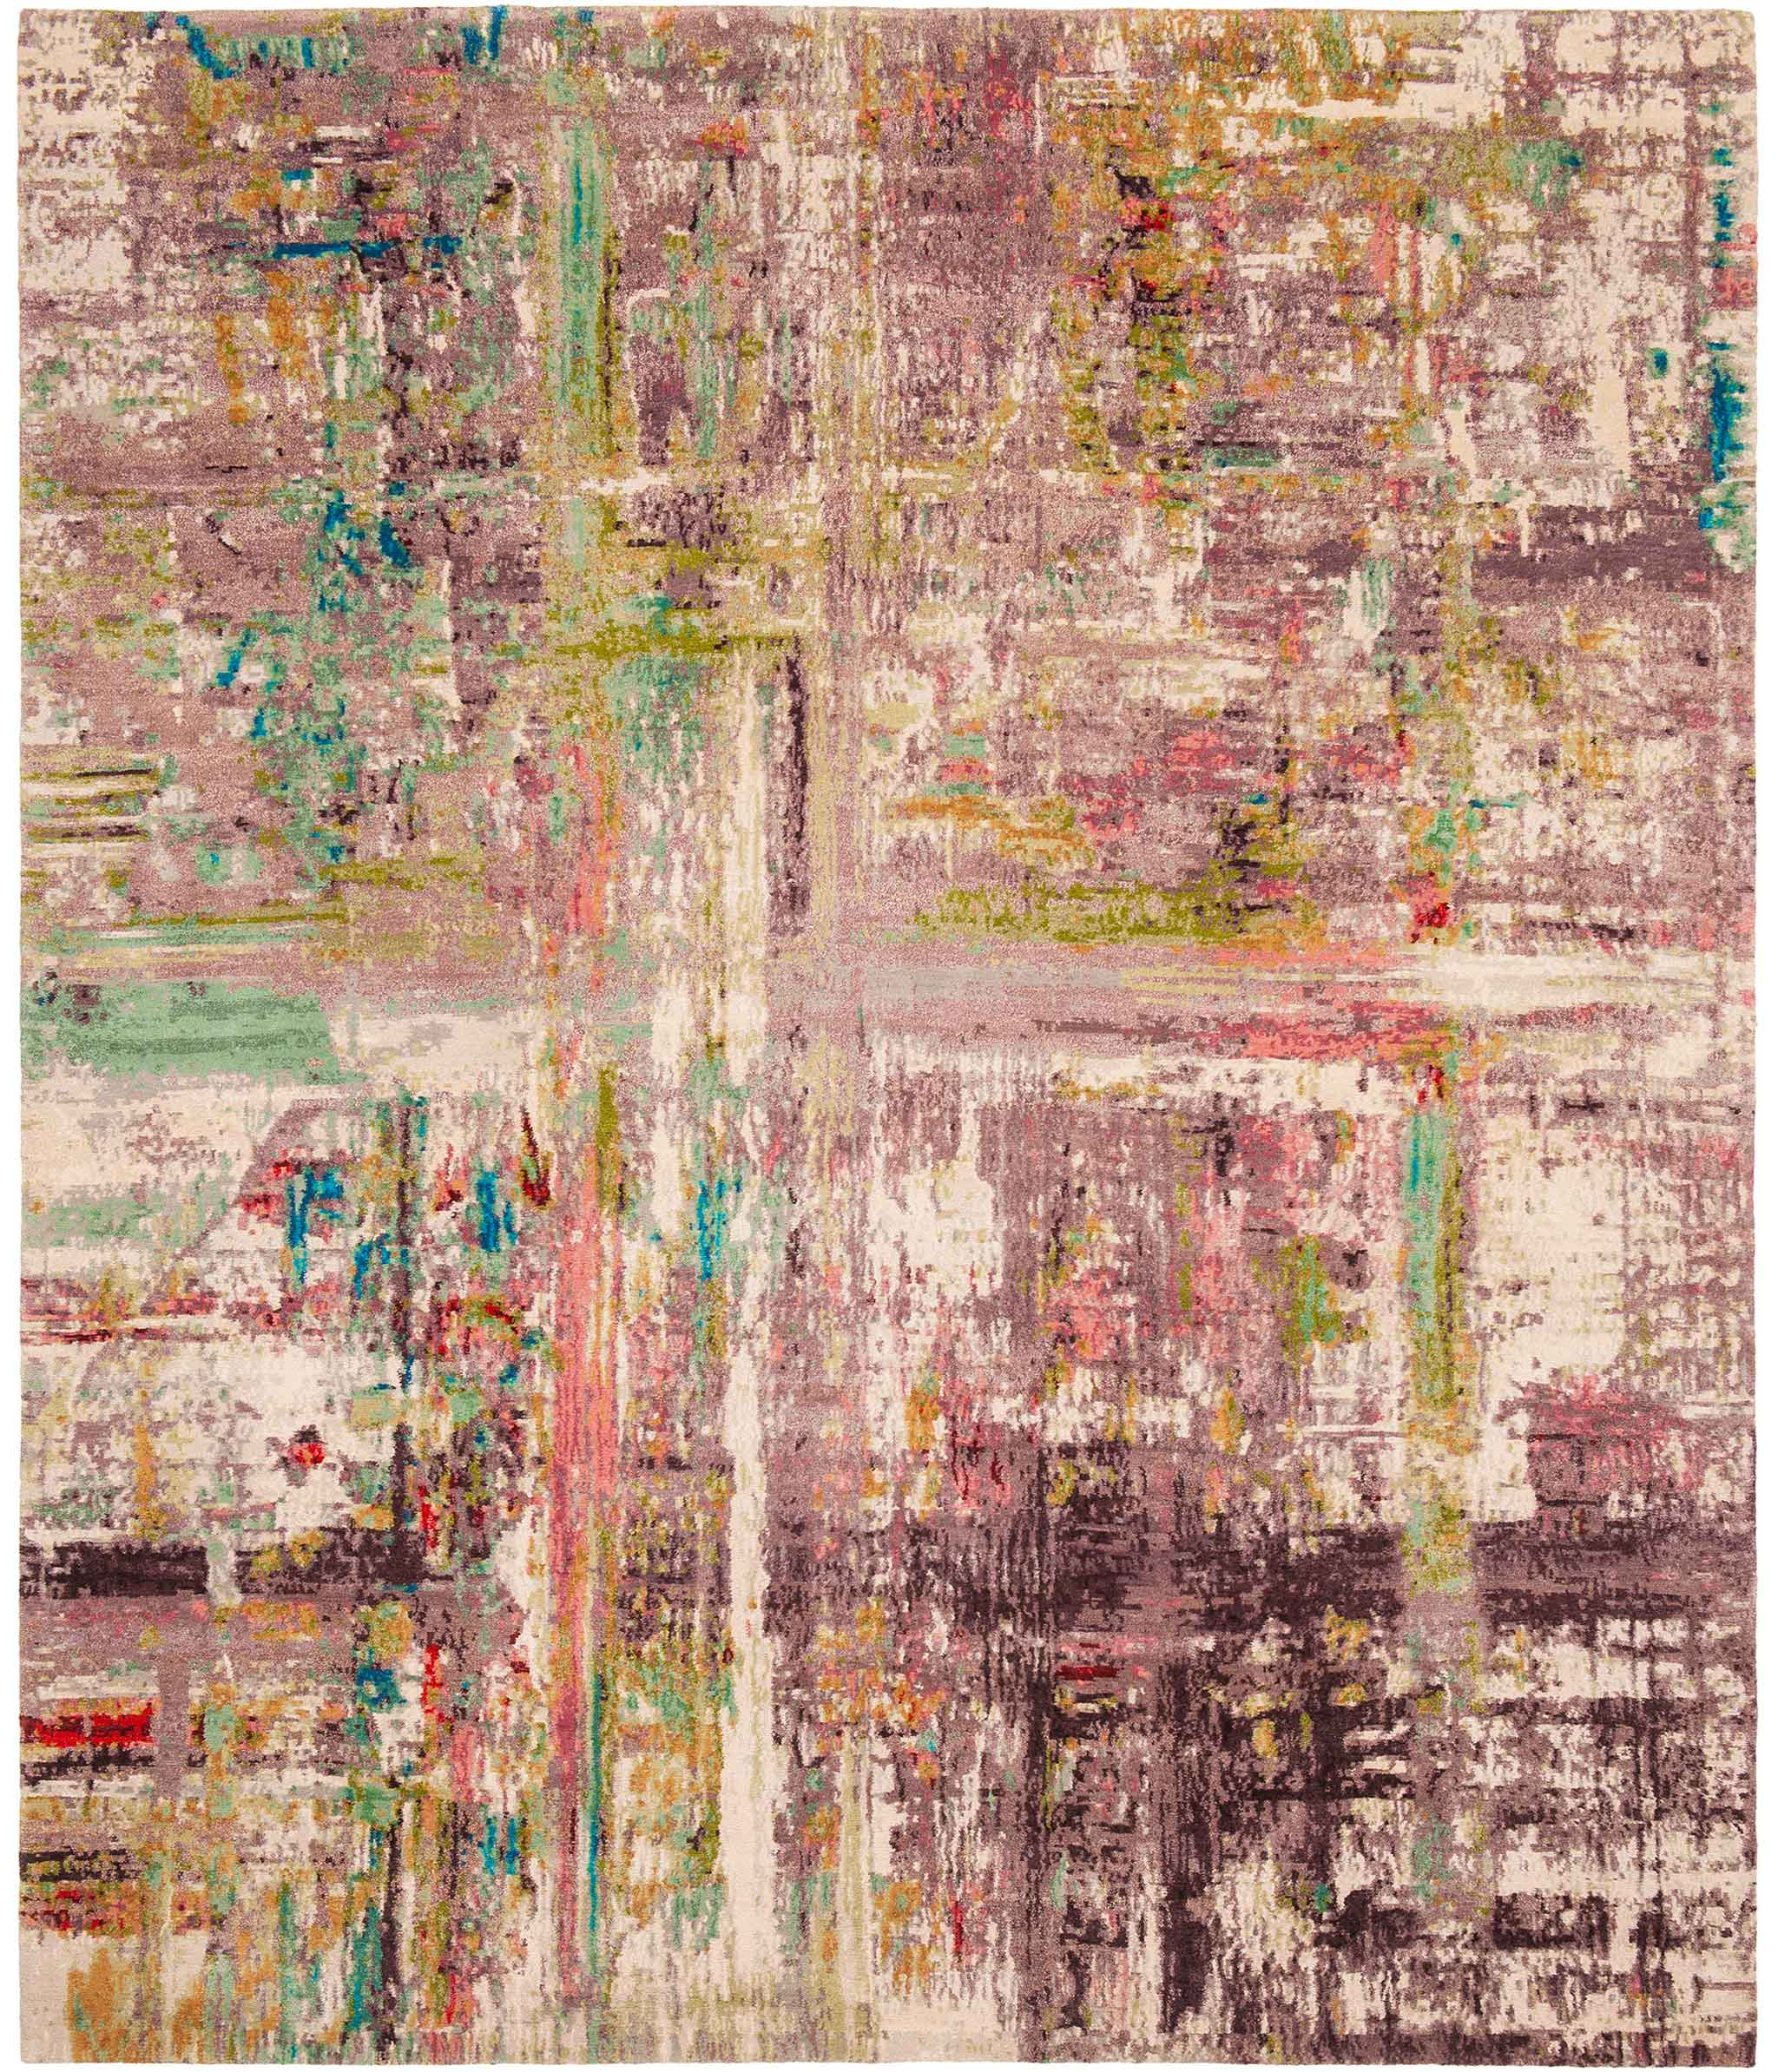 'Artwork 24' by Jan Kath | Image courtesy of Jan Kath.